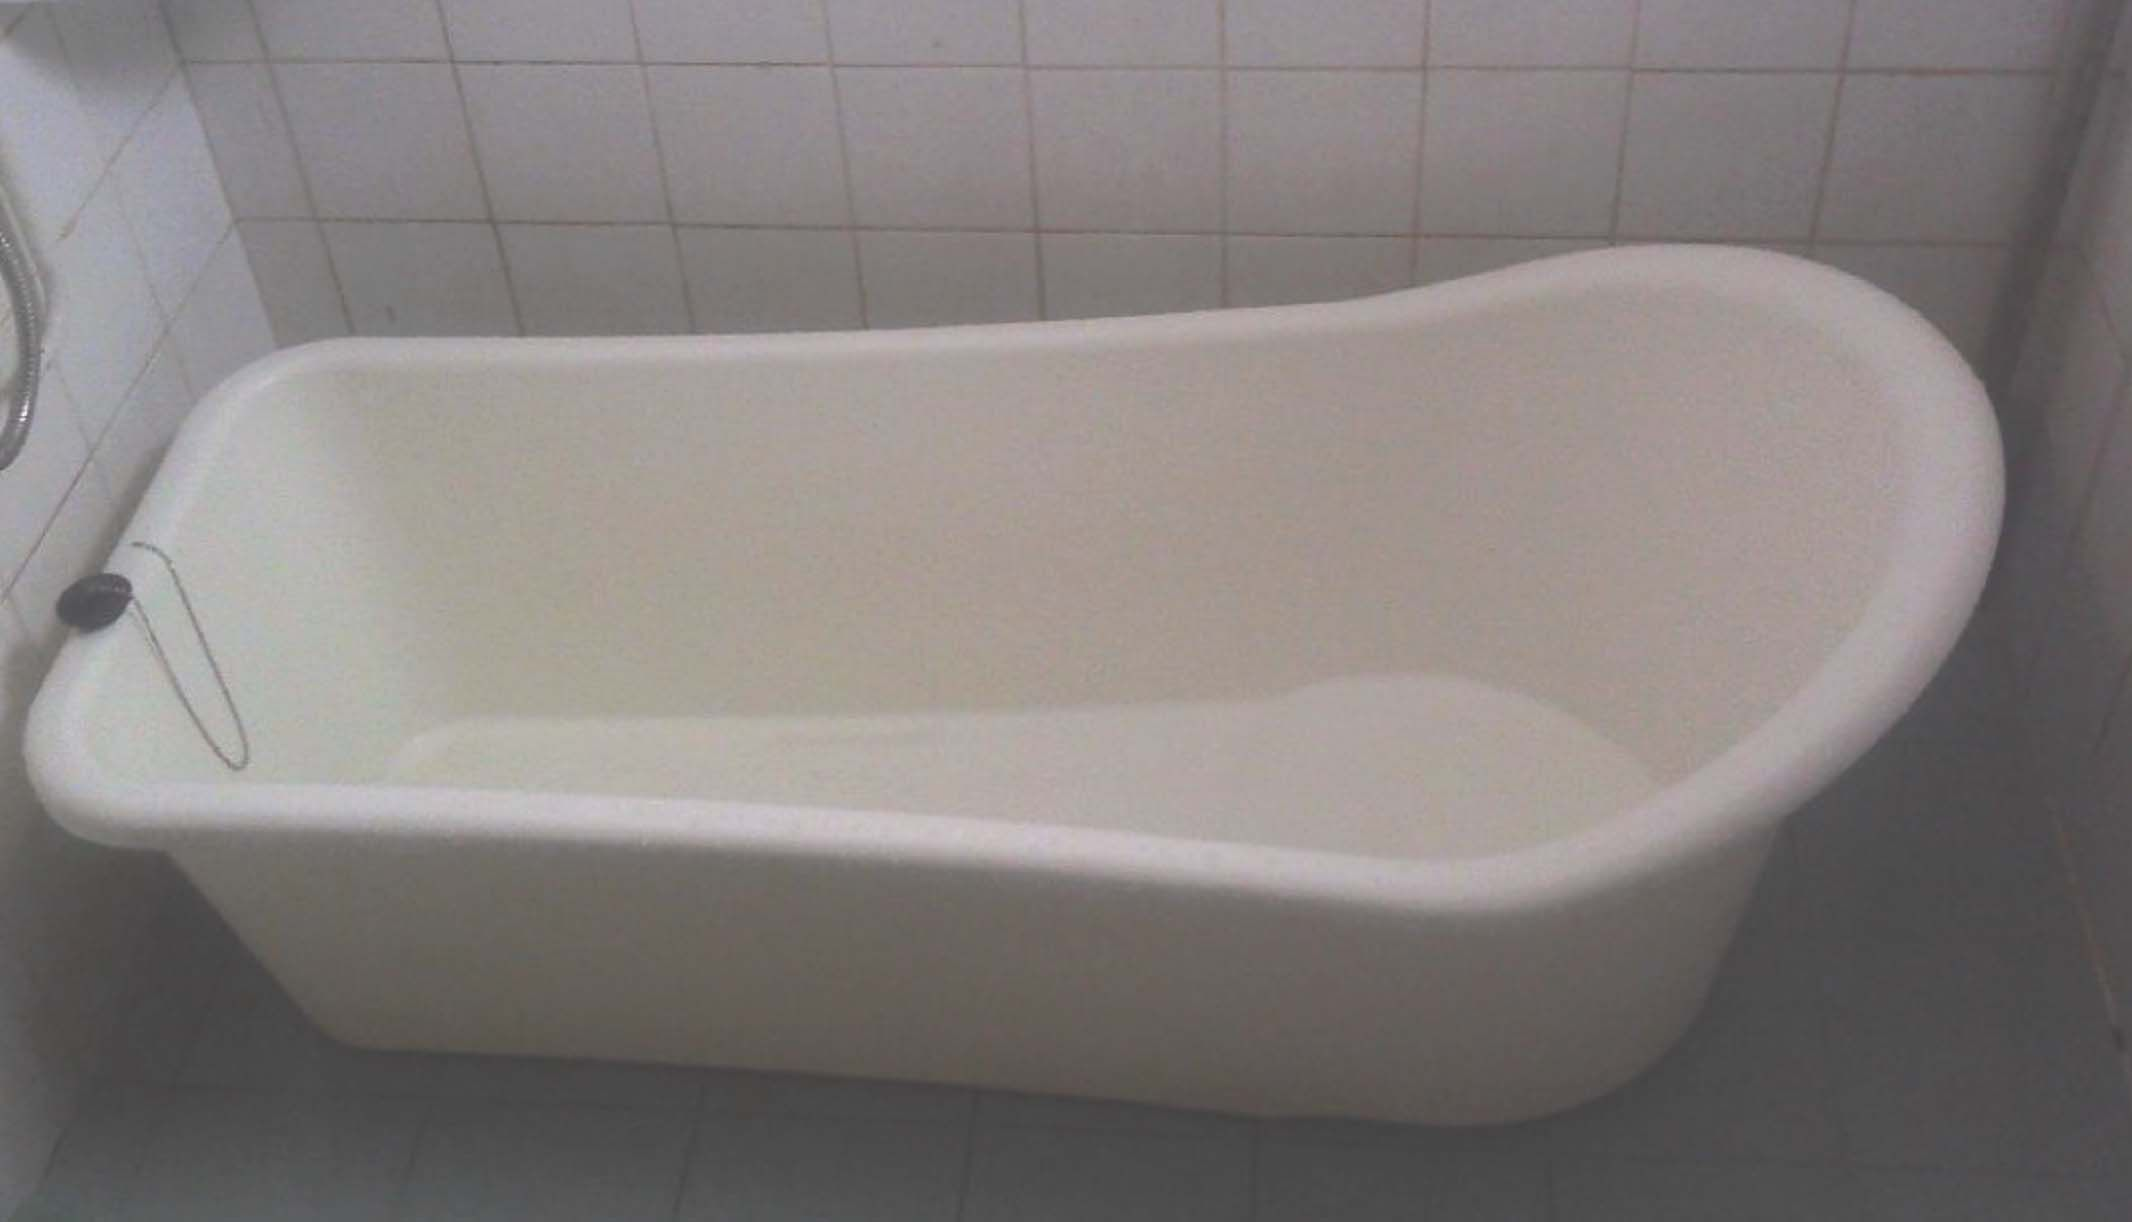 Toddler Bath Tubs For Showers White Long Portable Bathtub Bathroom Ideas Pinterest